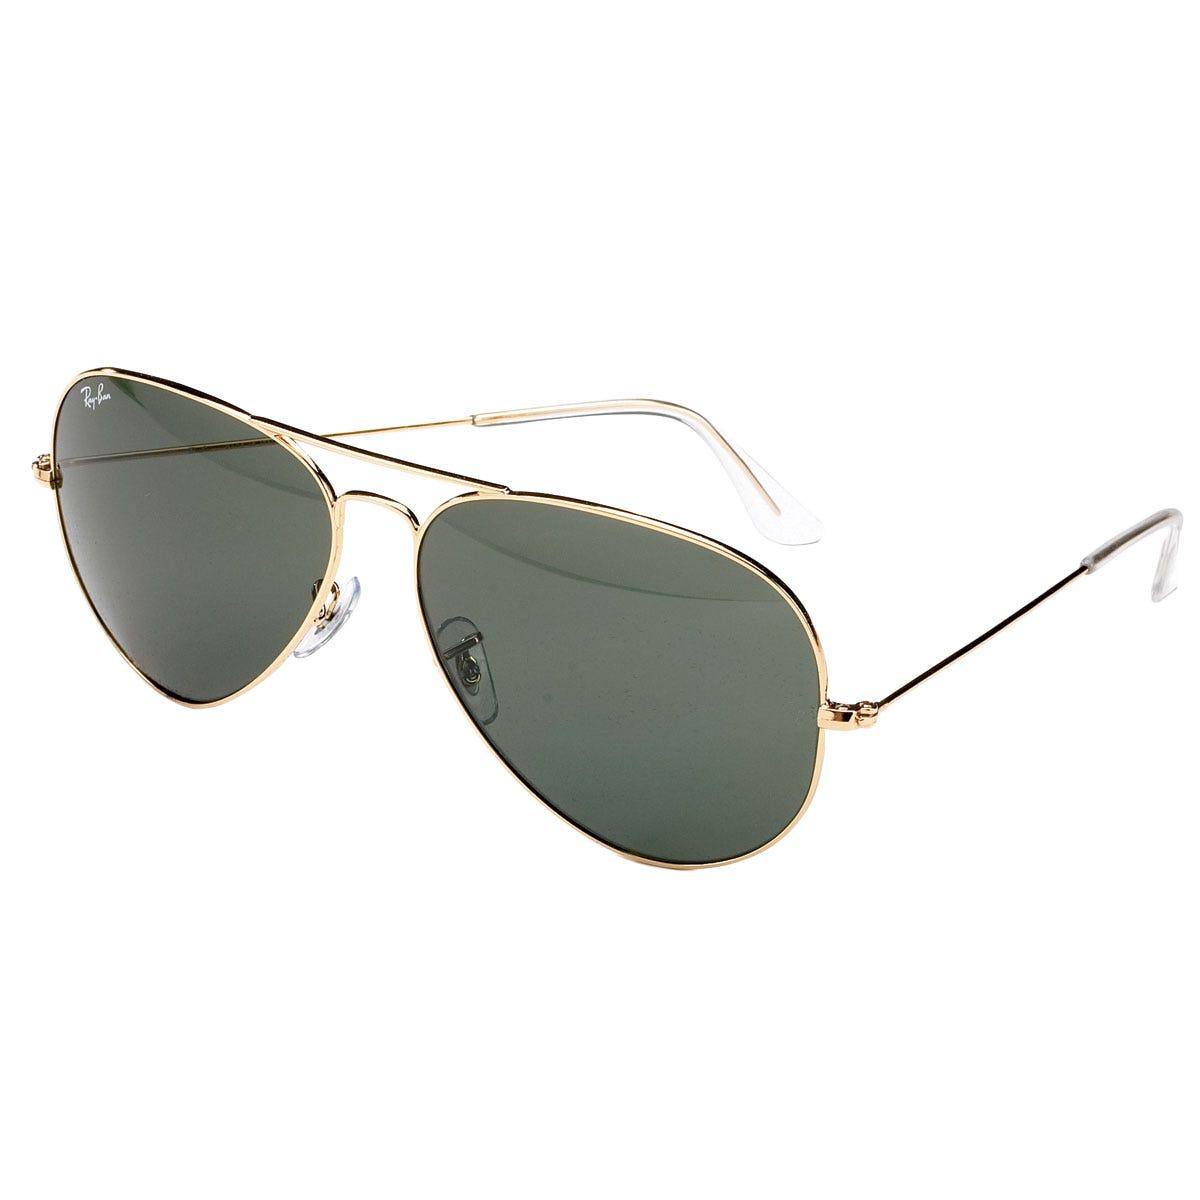 Ray ban sunglasses sale new zealand - Black Frames